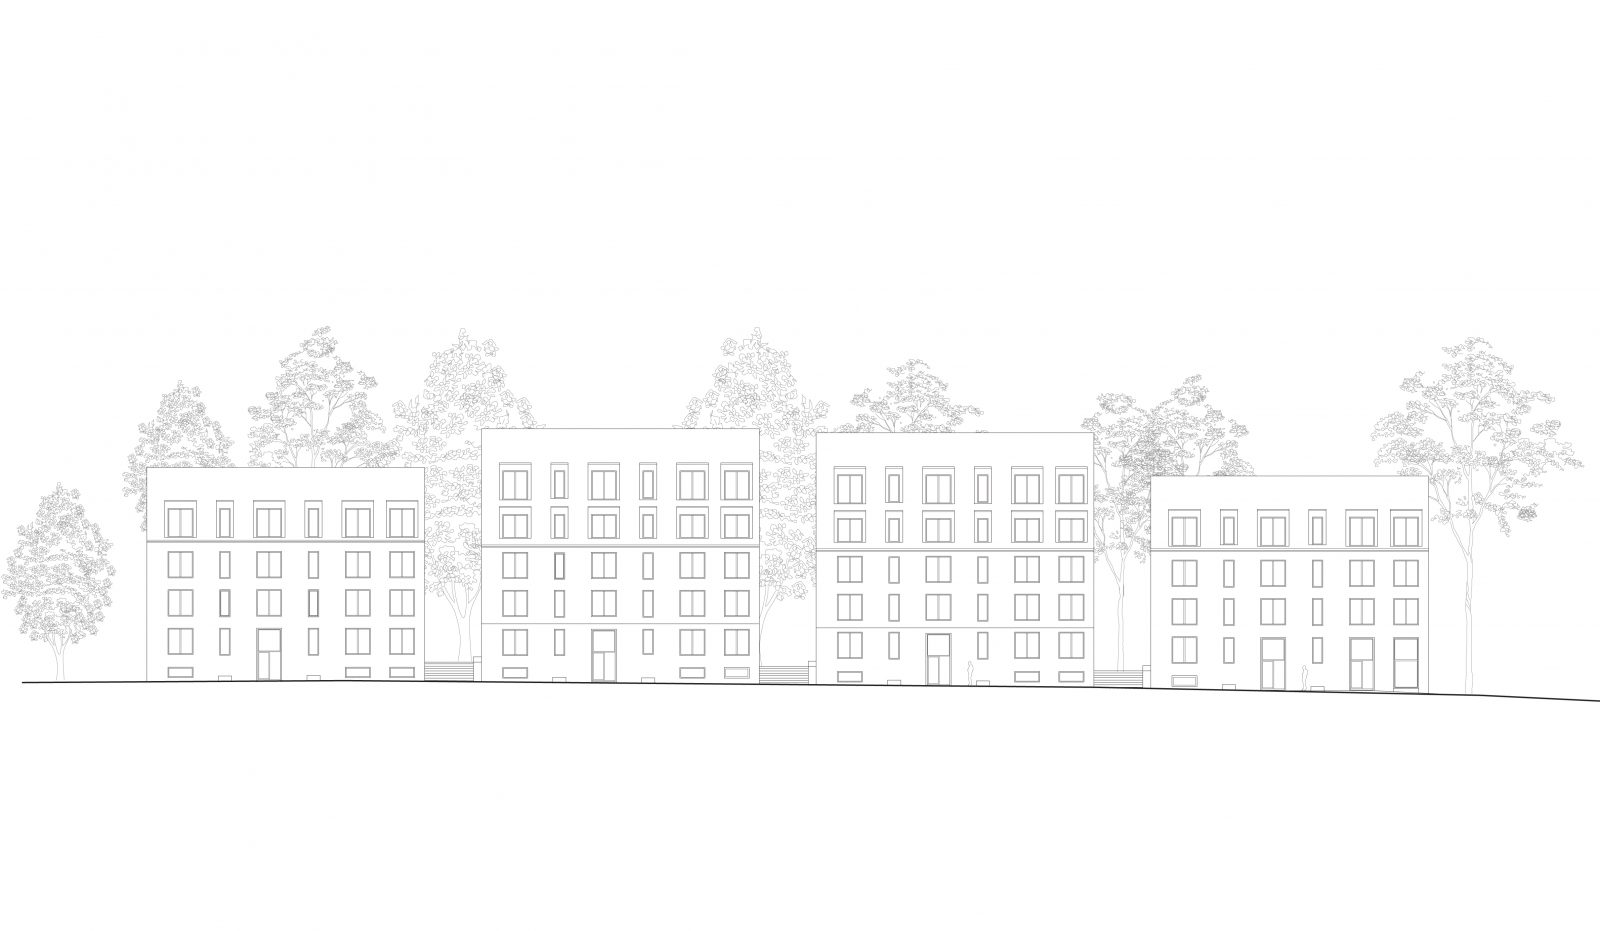 P:ProjektDalens ParkAModell2012-11-26 fasader Model (1)